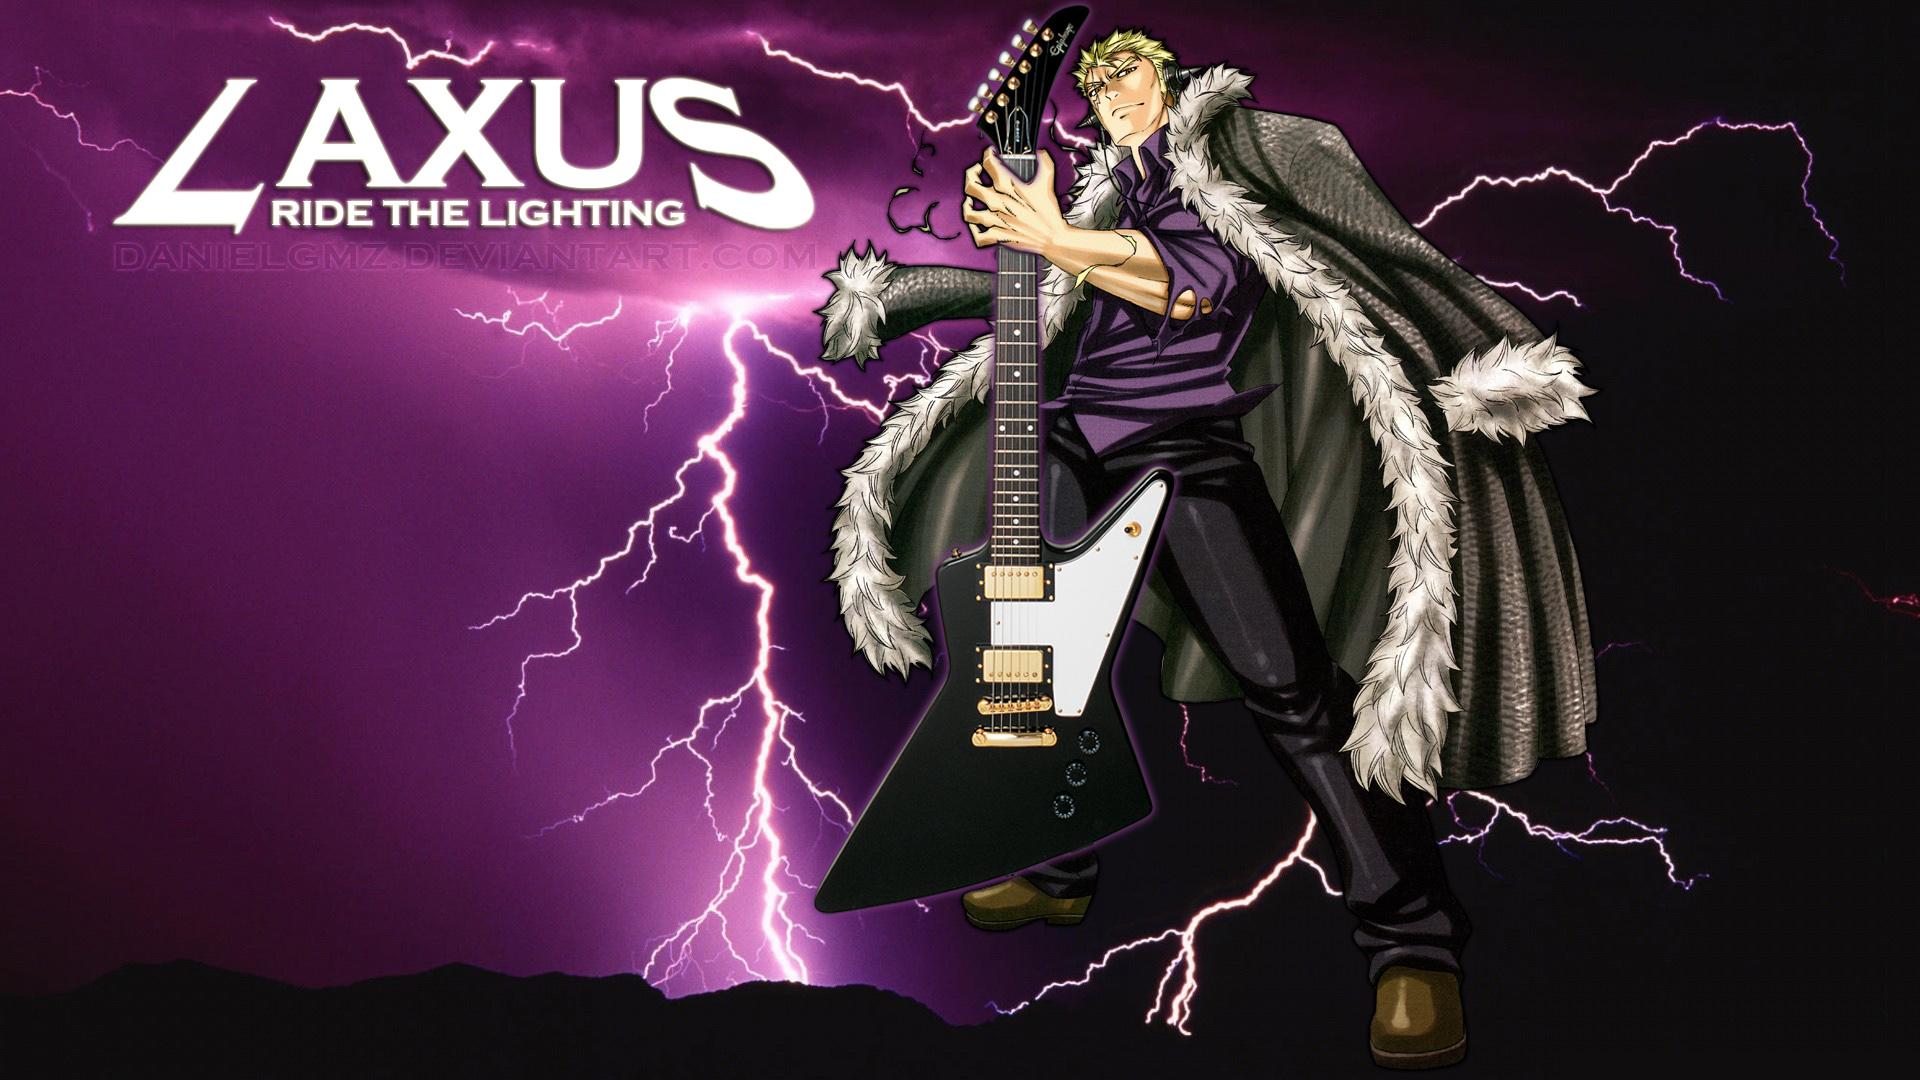 Laxus: Ride the Lighting by Danielgmz on DeviantArt